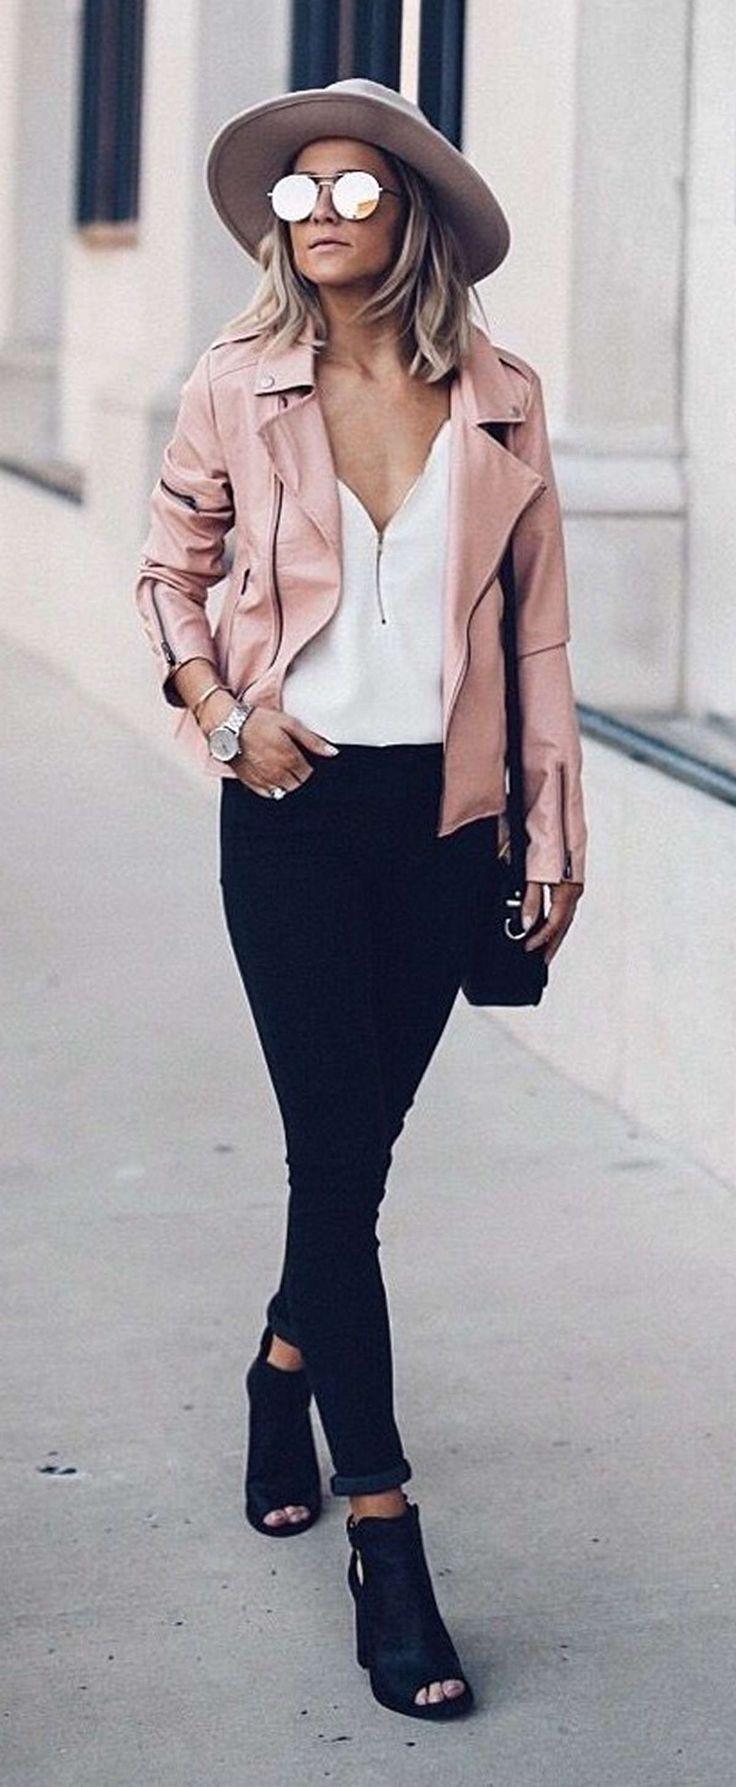 34 best Victoria Justice! D images on Pinterest ...